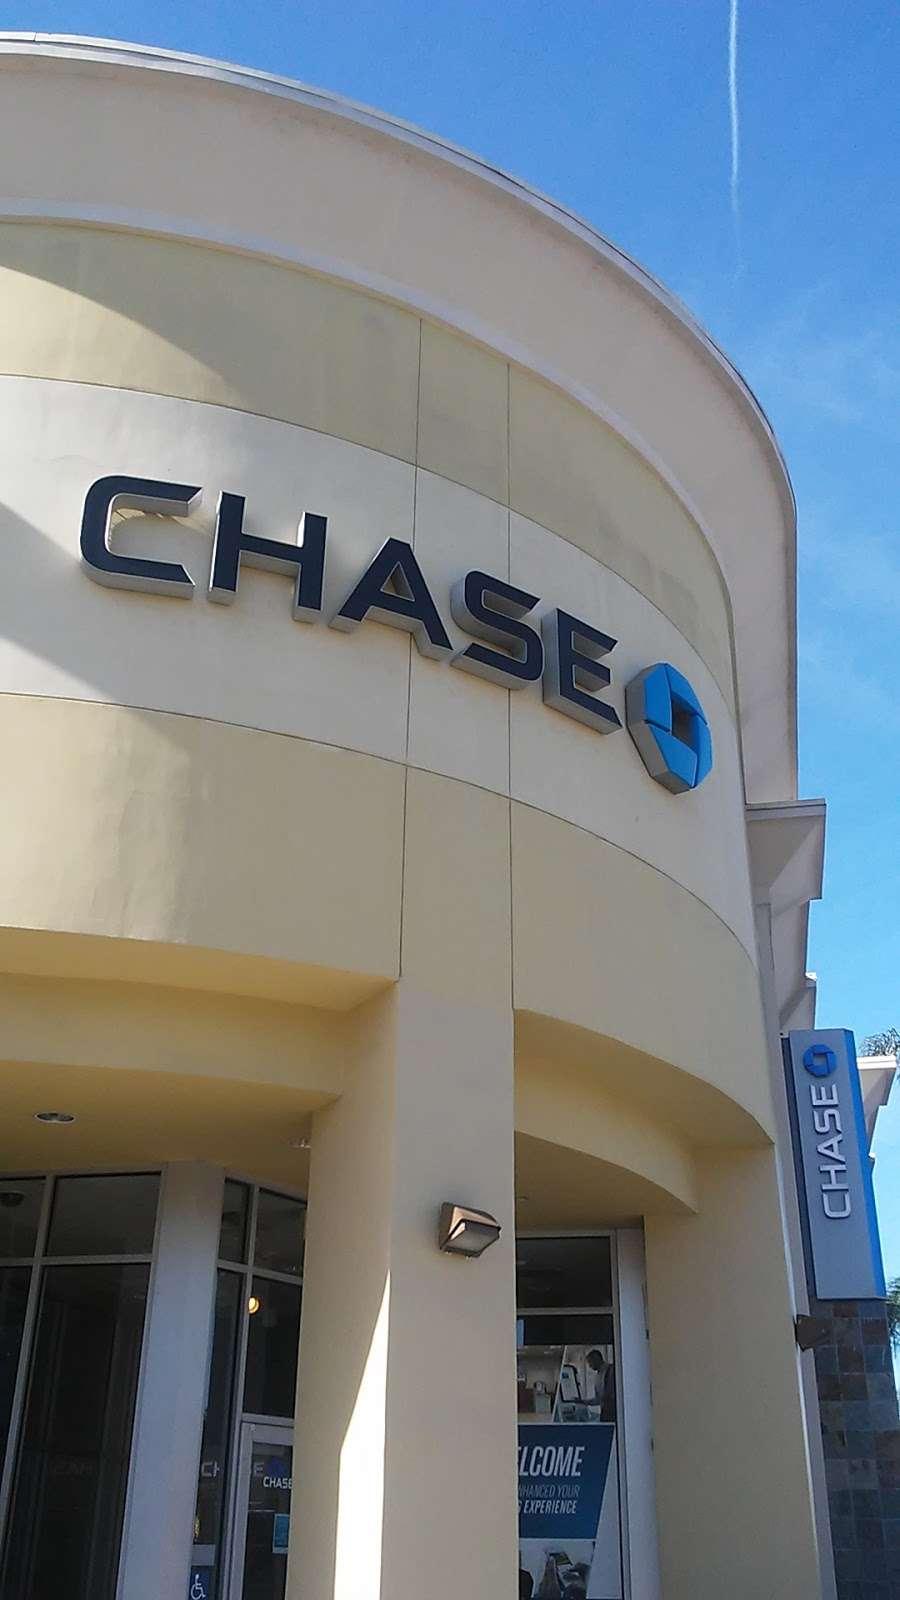 Chase Bank - bank  | Photo 1 of 4 | Address: 3840 Martin Luther King Jr Blvd, Lynwood, CA 90262, USA | Phone: (310) 637-8040